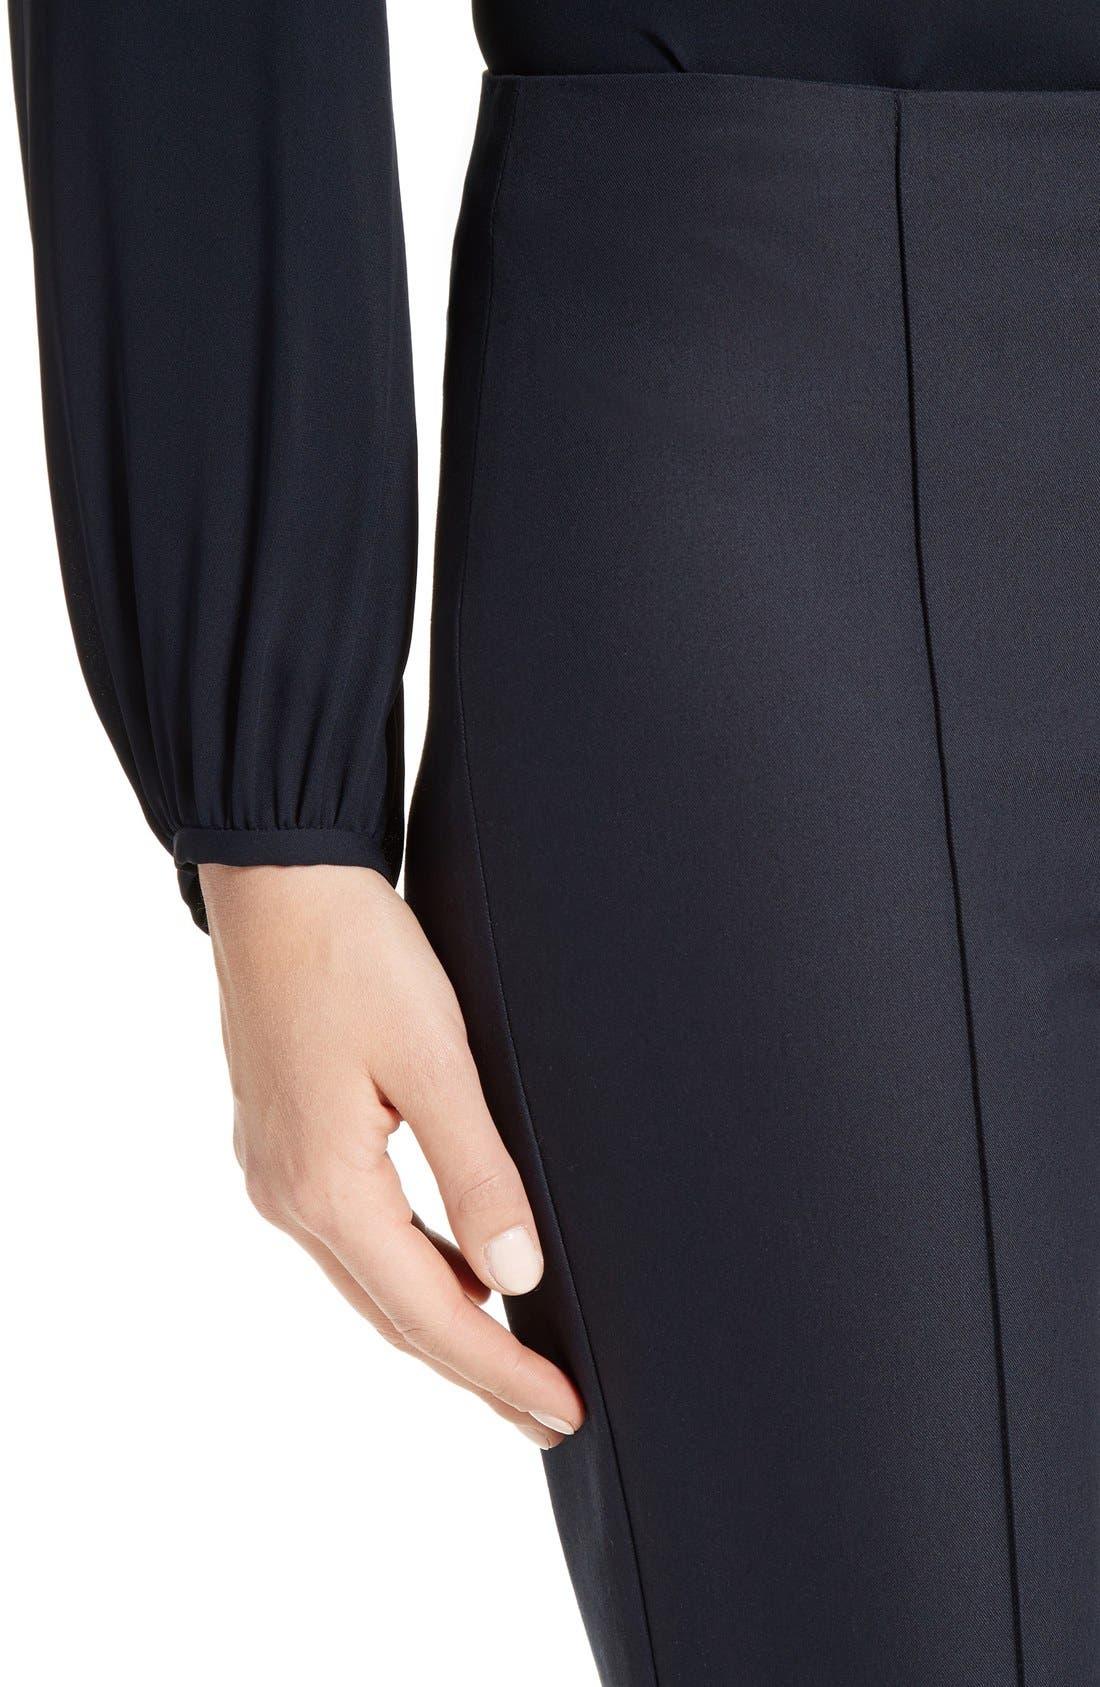 Alettah Stretch Skinny Pants,                             Alternate thumbnail 9, color,                             001